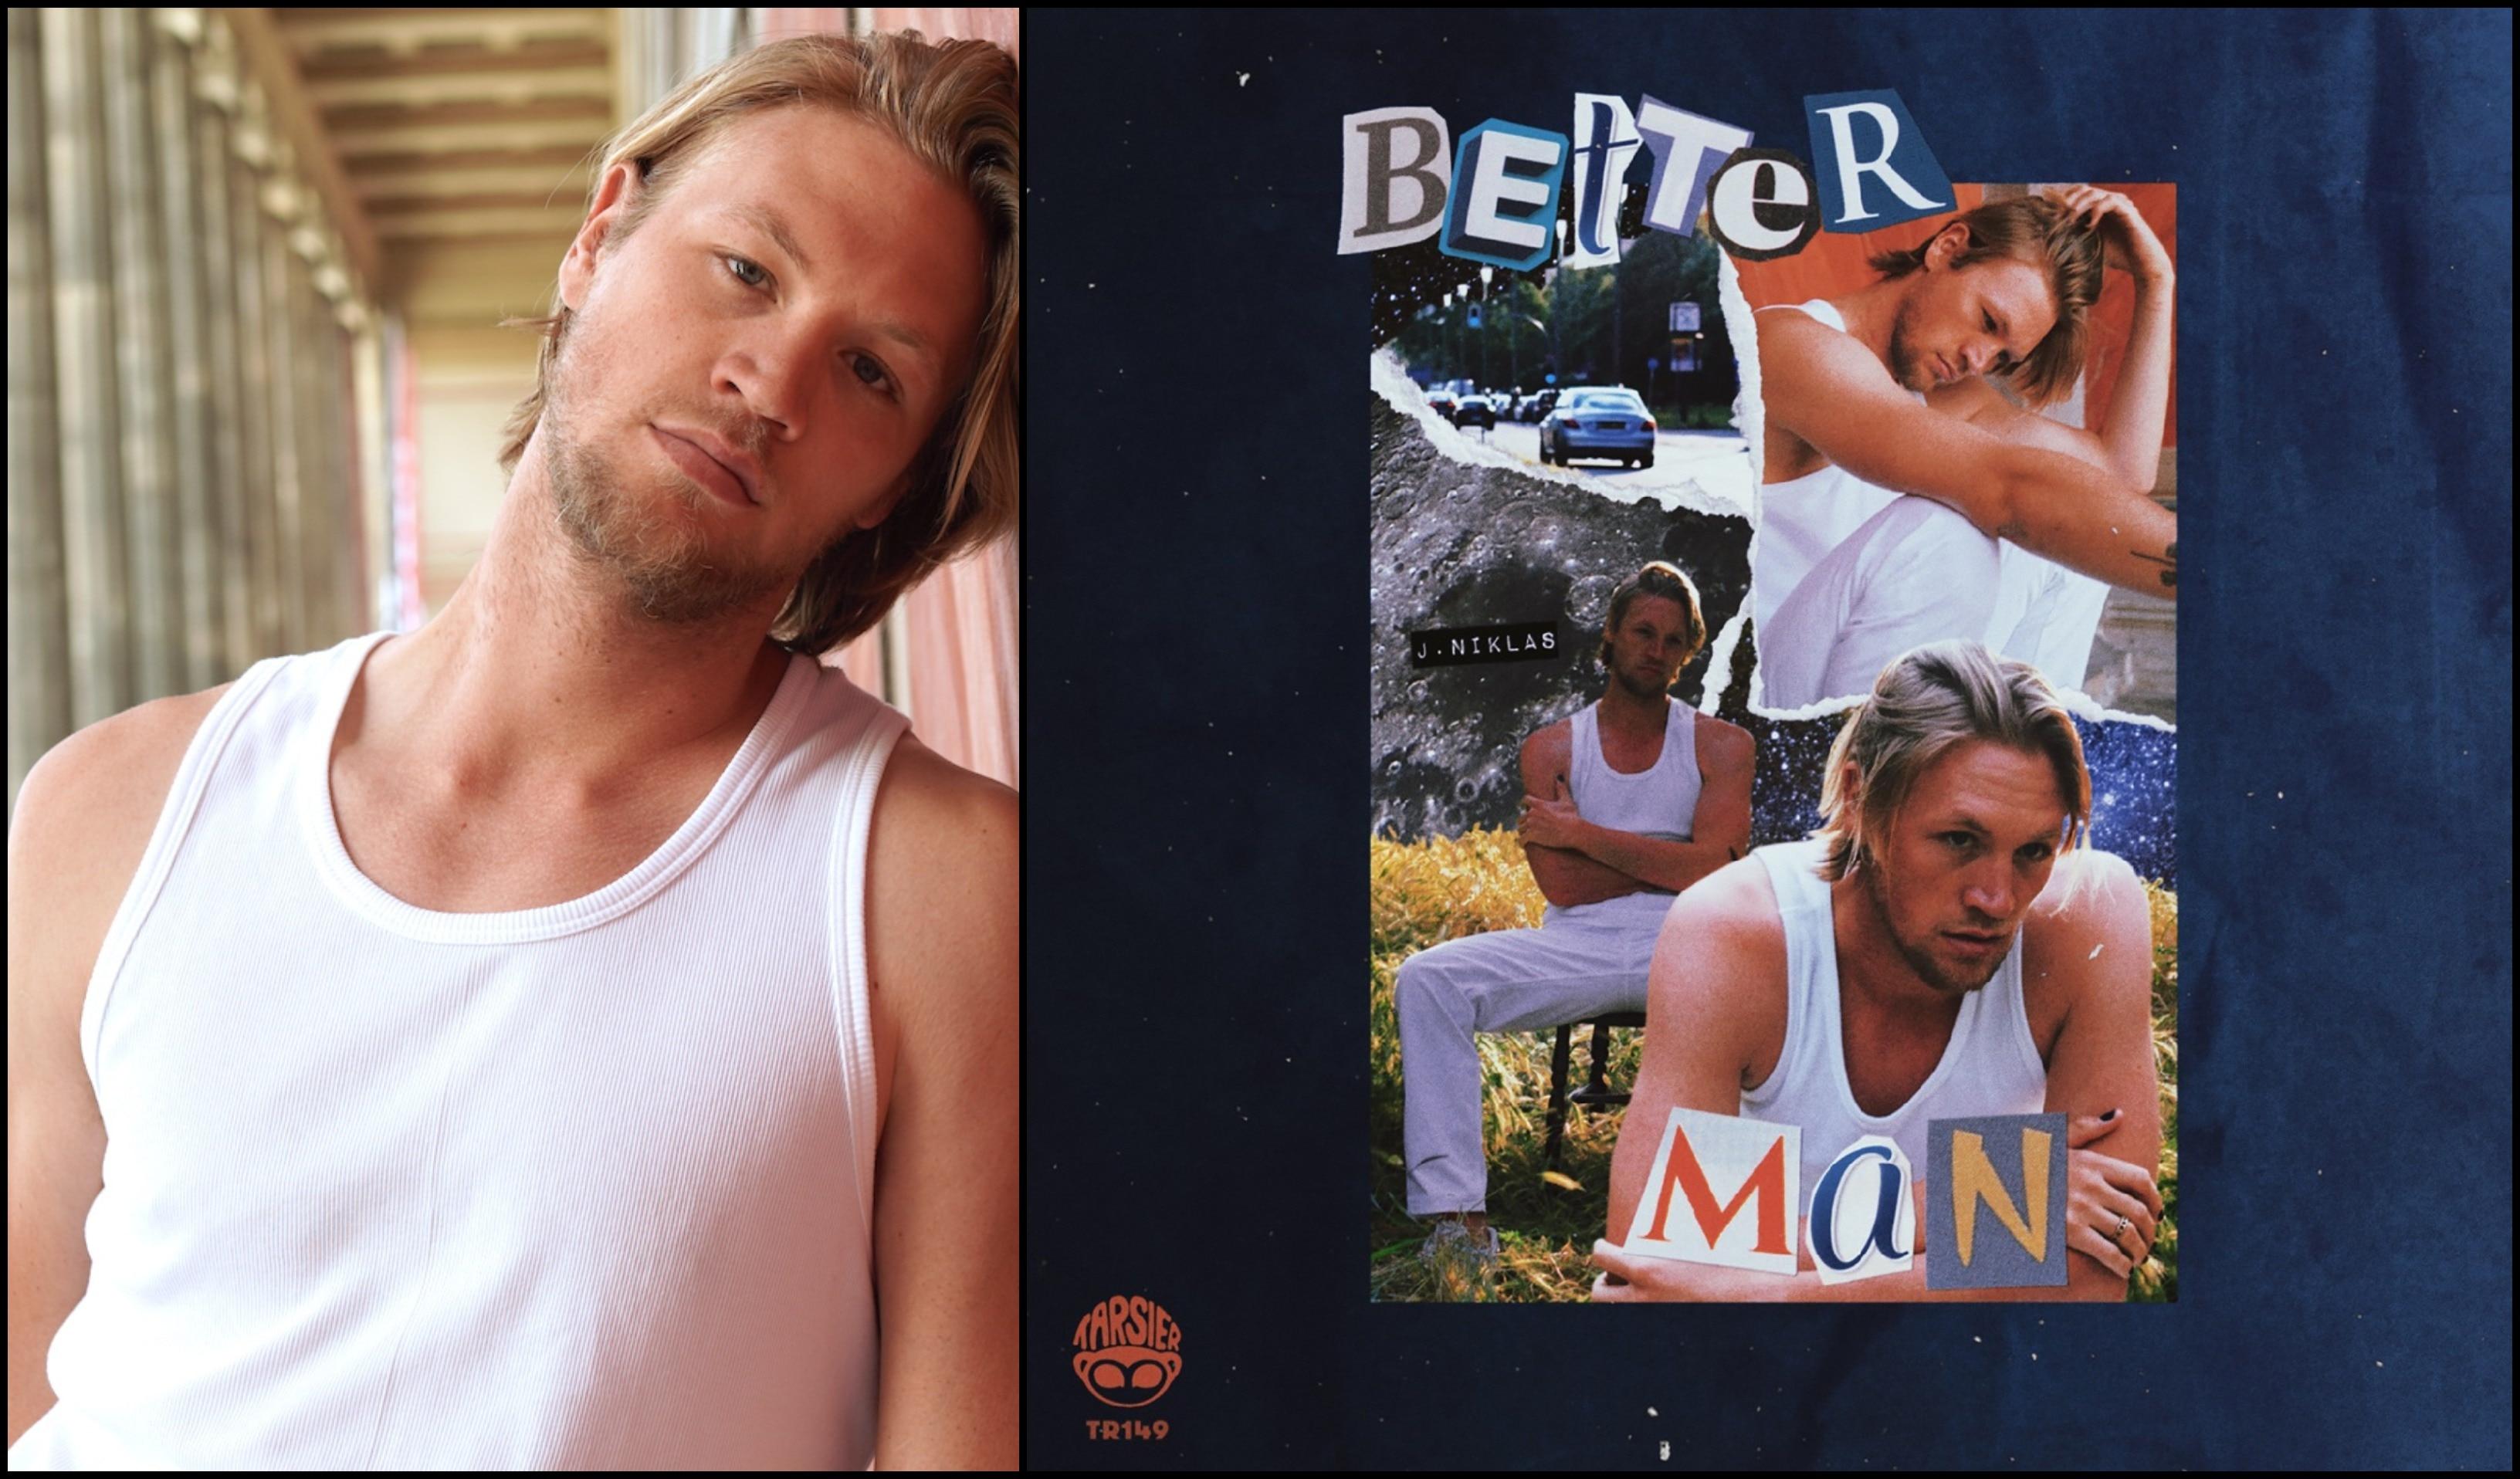 "German music artist J. Niklas drops meaningful single ""Better Man"""